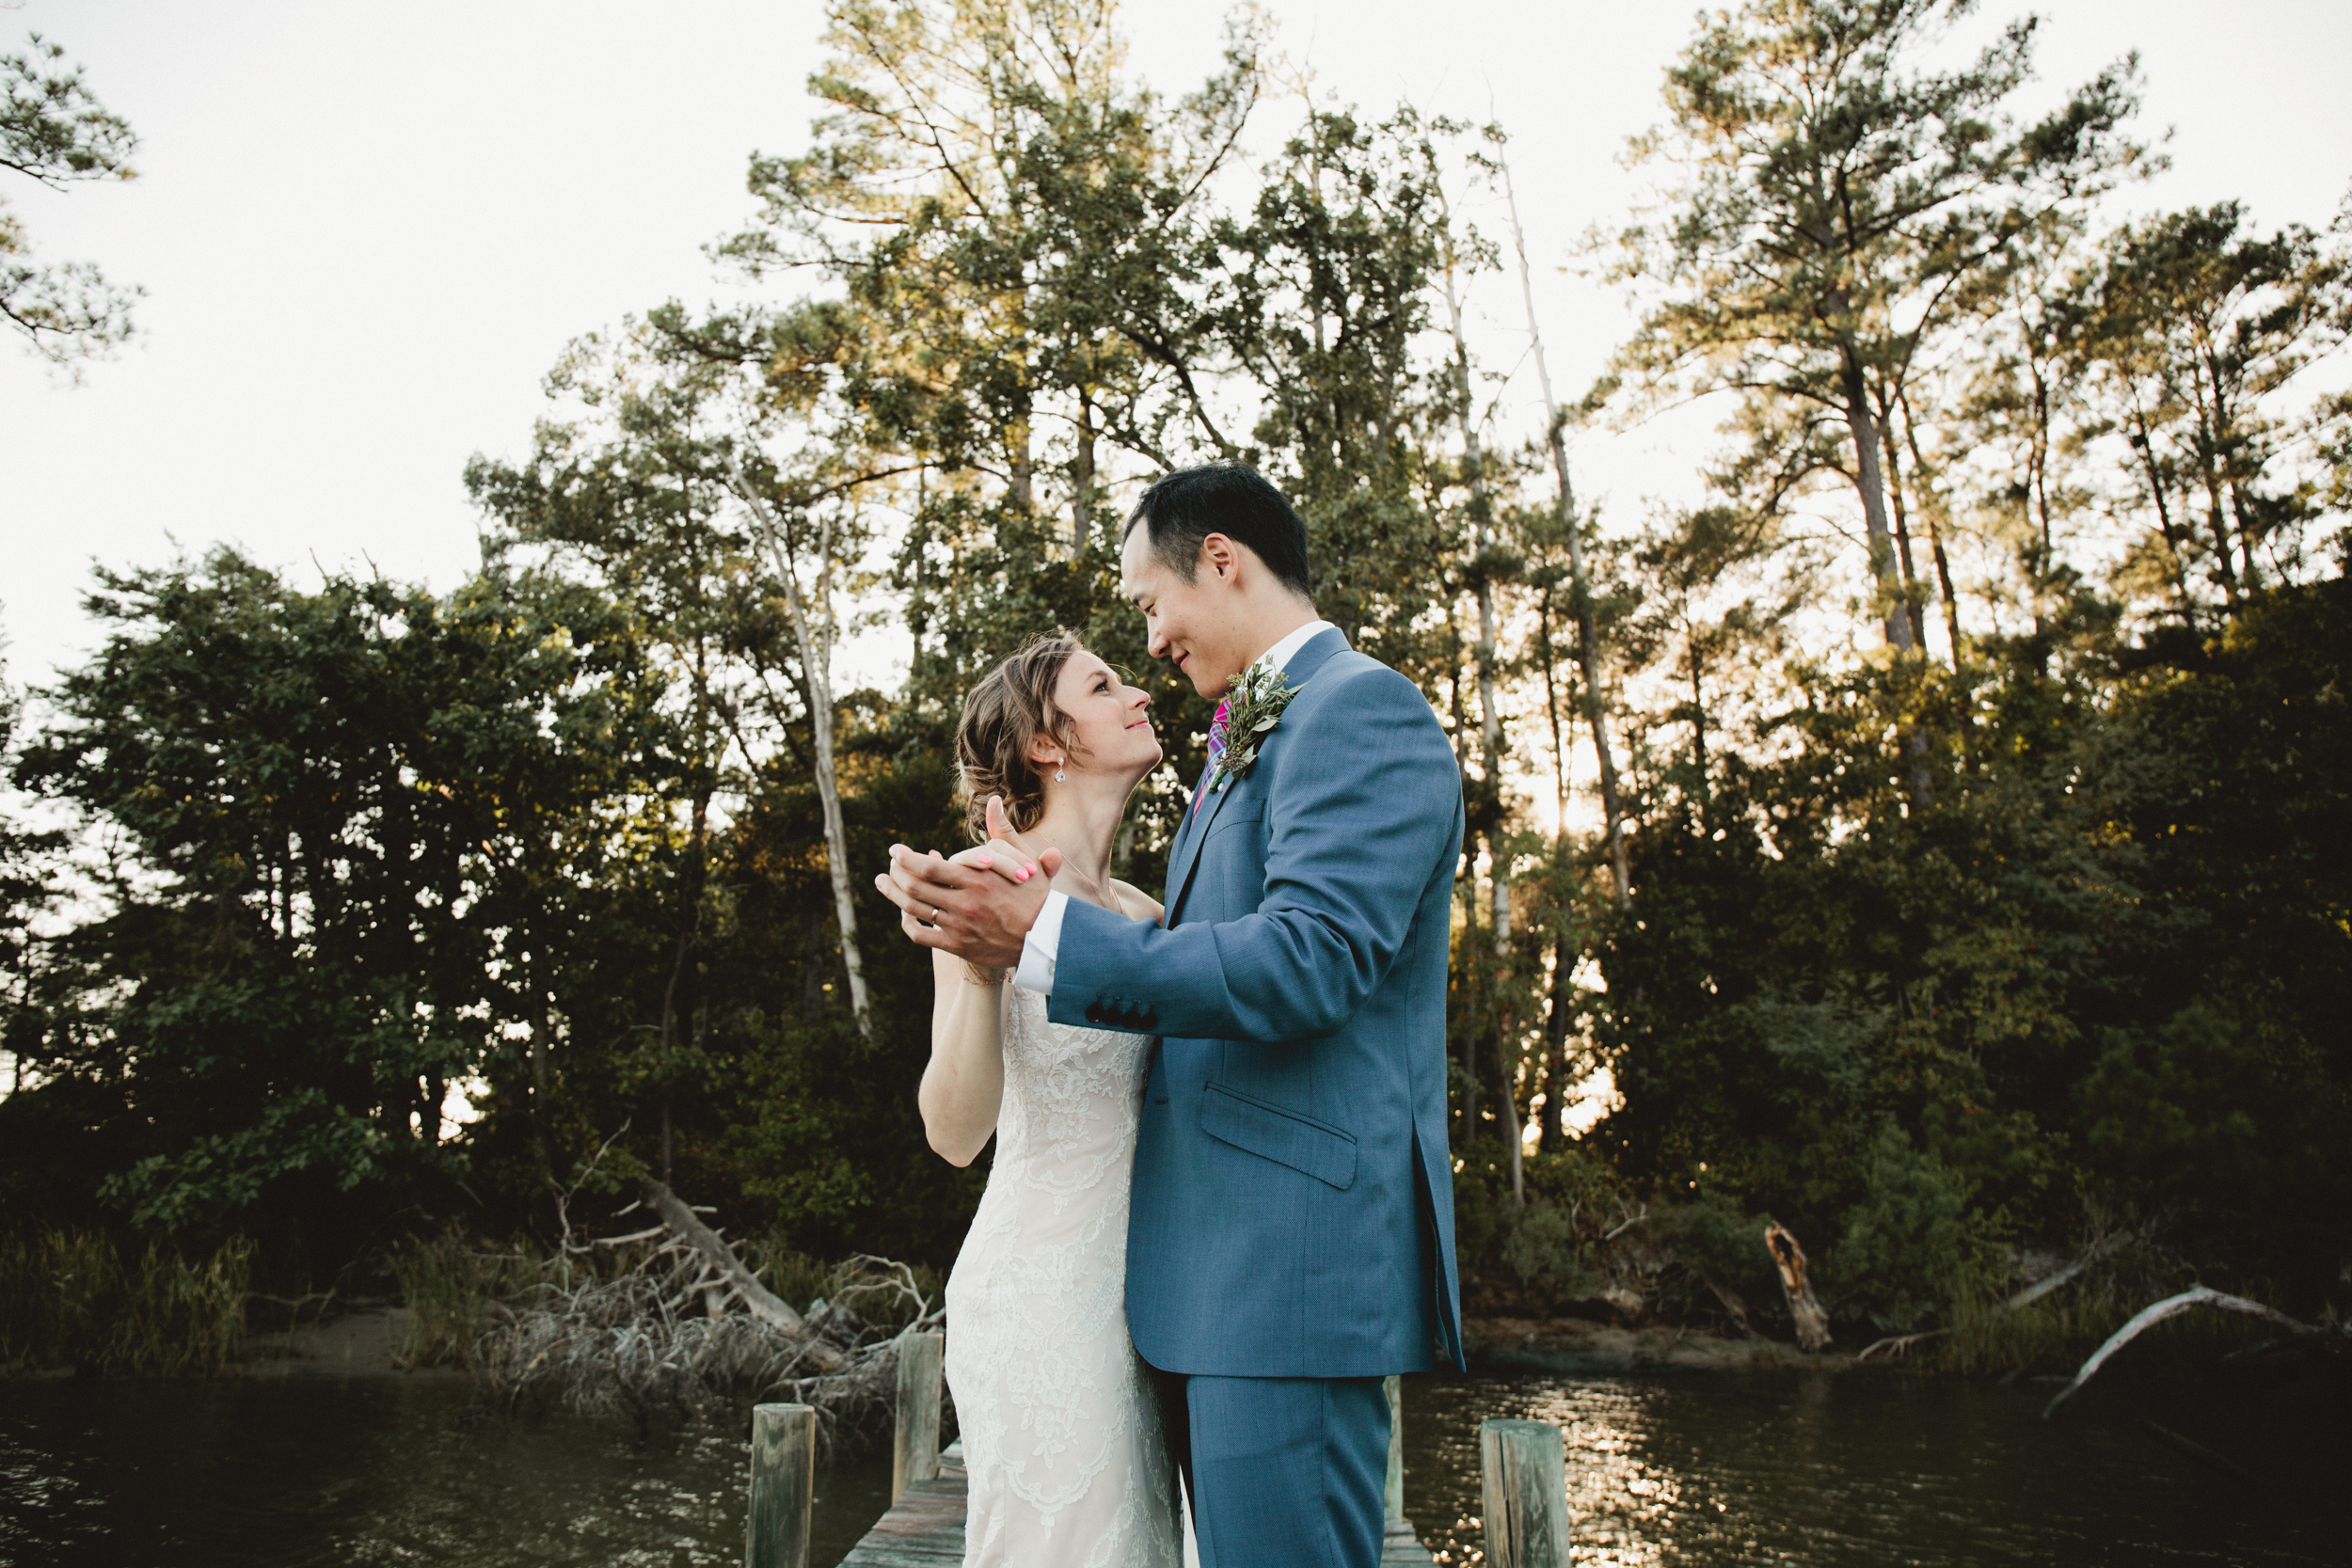 Maine-Wedding-Photographer-1056.jpg